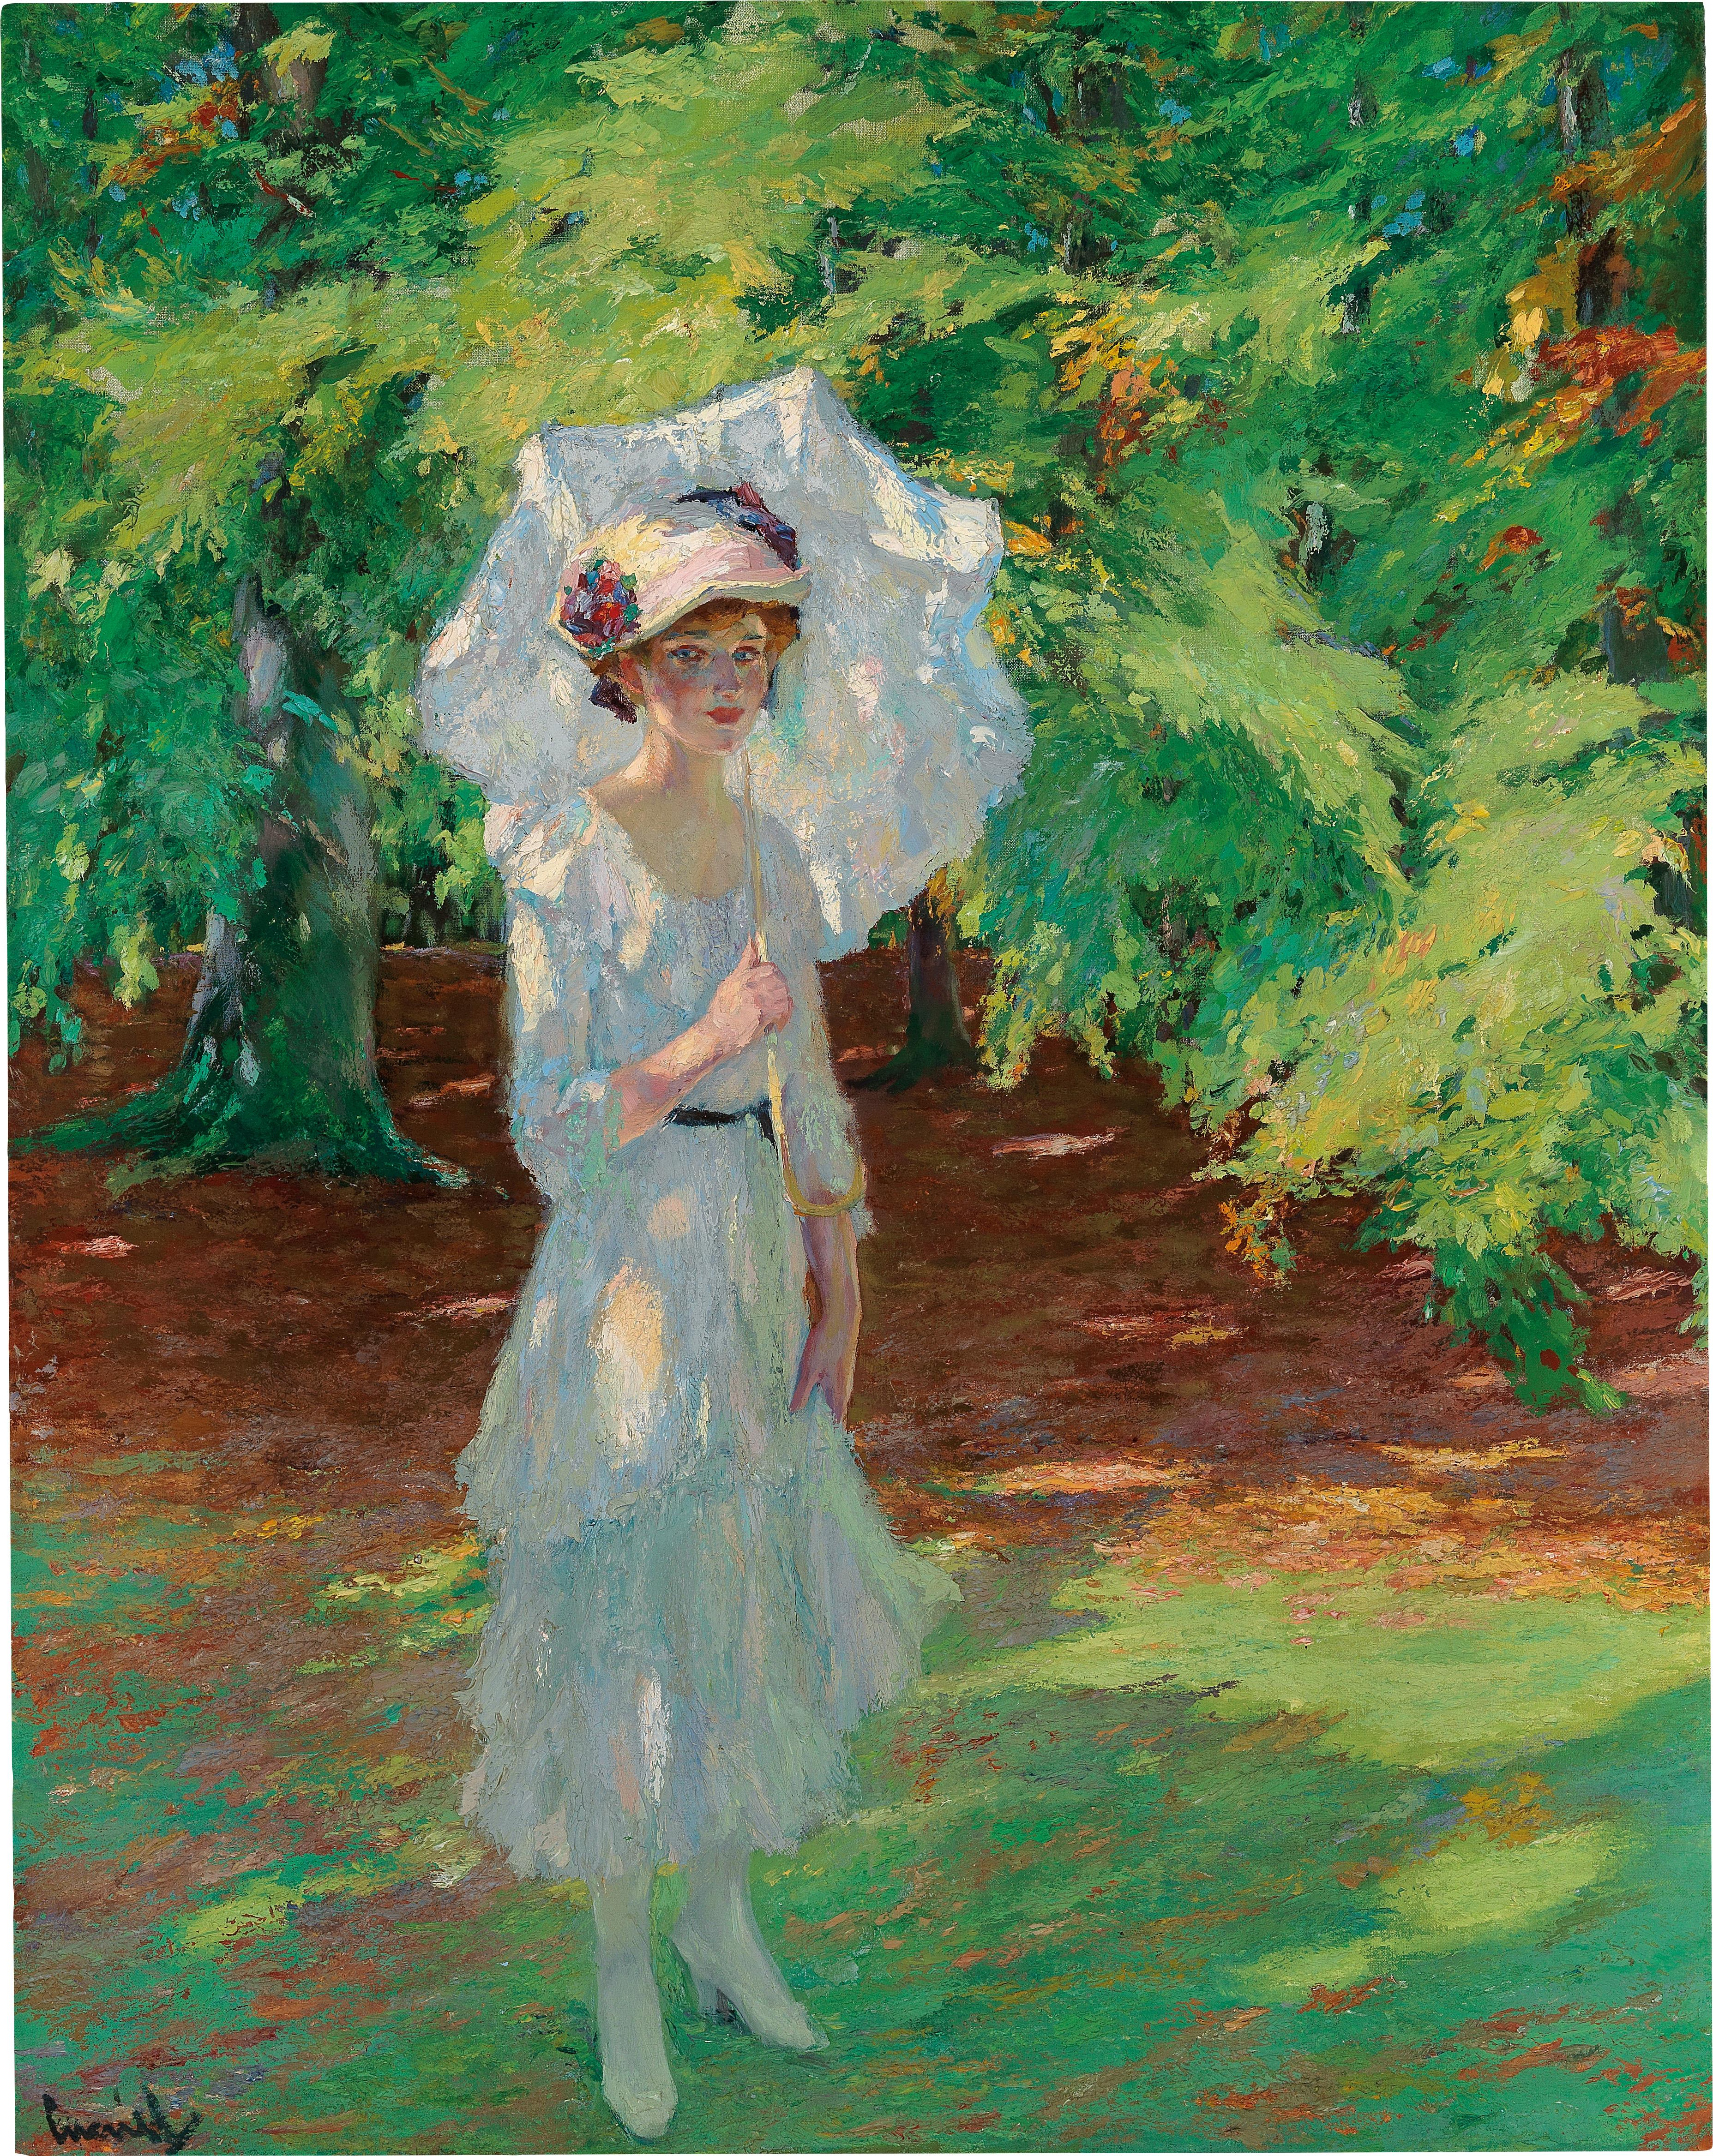 Edward Cucuel (San Francisco 1875–1951 Pasadena). Waldlichtung (forest glade), oil on canvas